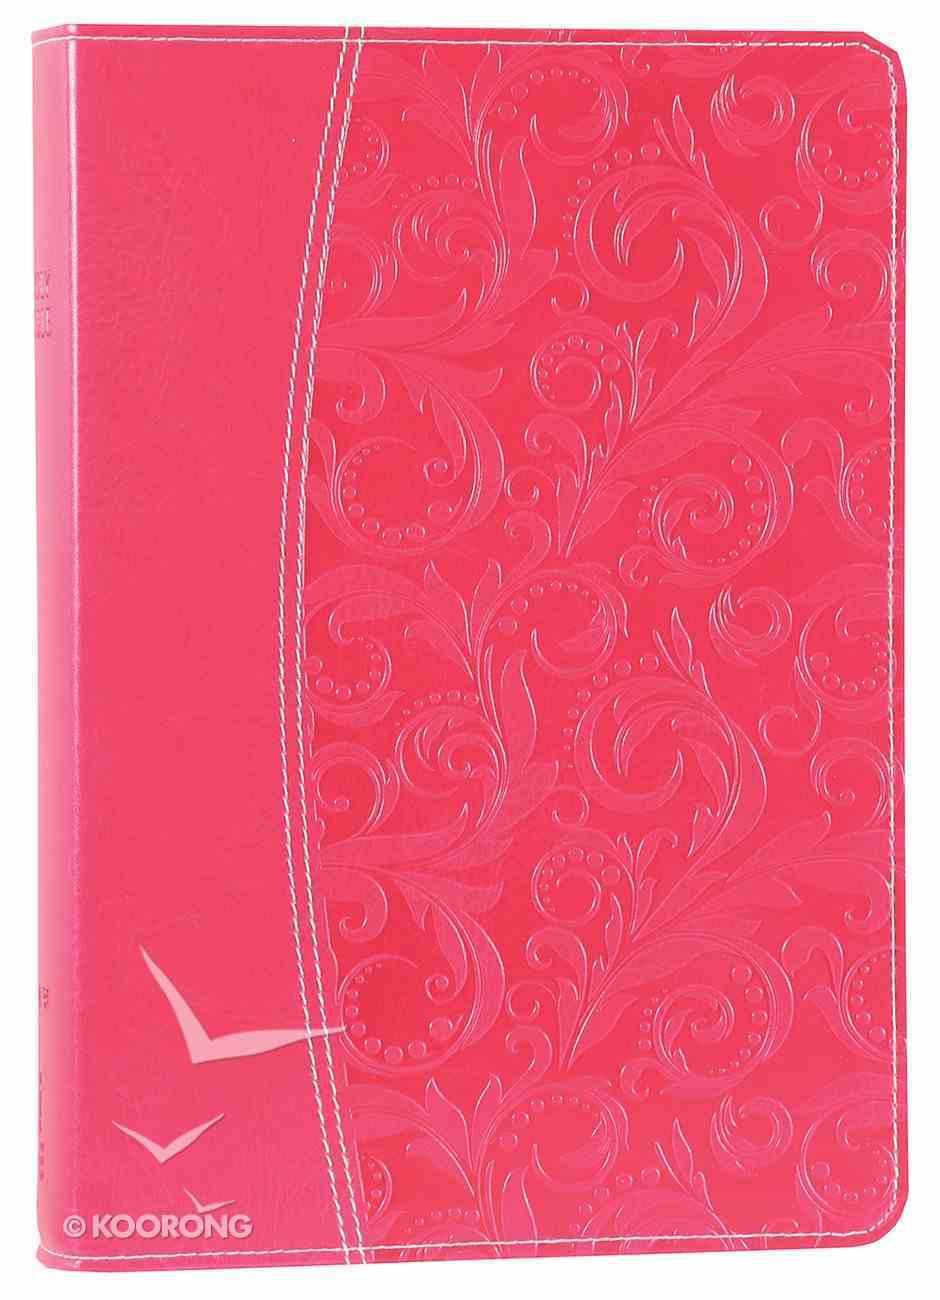 NIV Essentials Study Bible Honeysuckle Pink Premium Imitation Leather